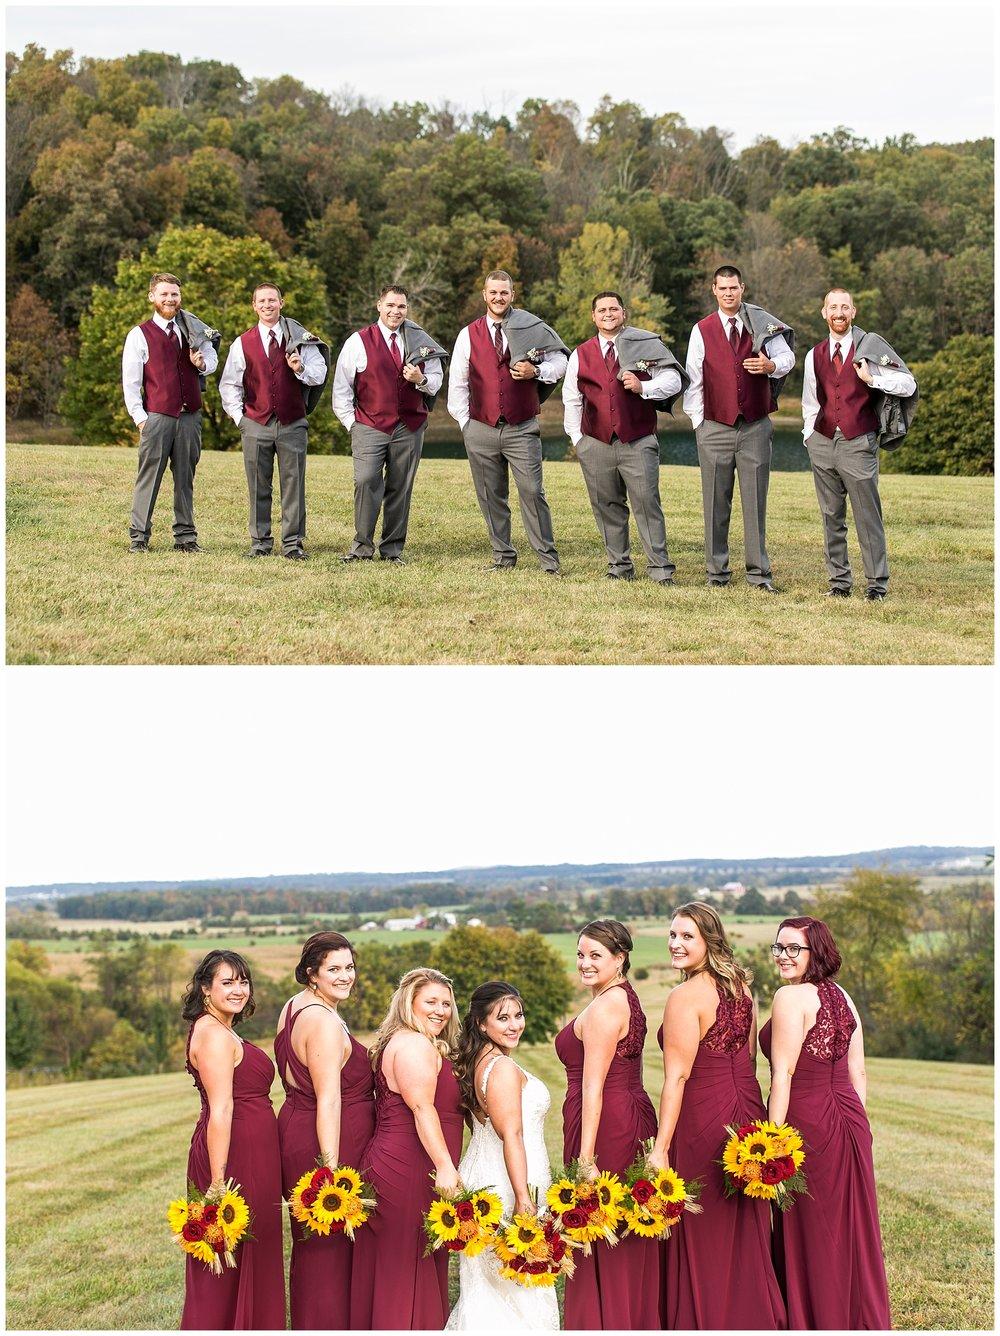 M+K Lodges at Gettysburg Wedding LivingRadiantPhotographyphotos_0021.jpg